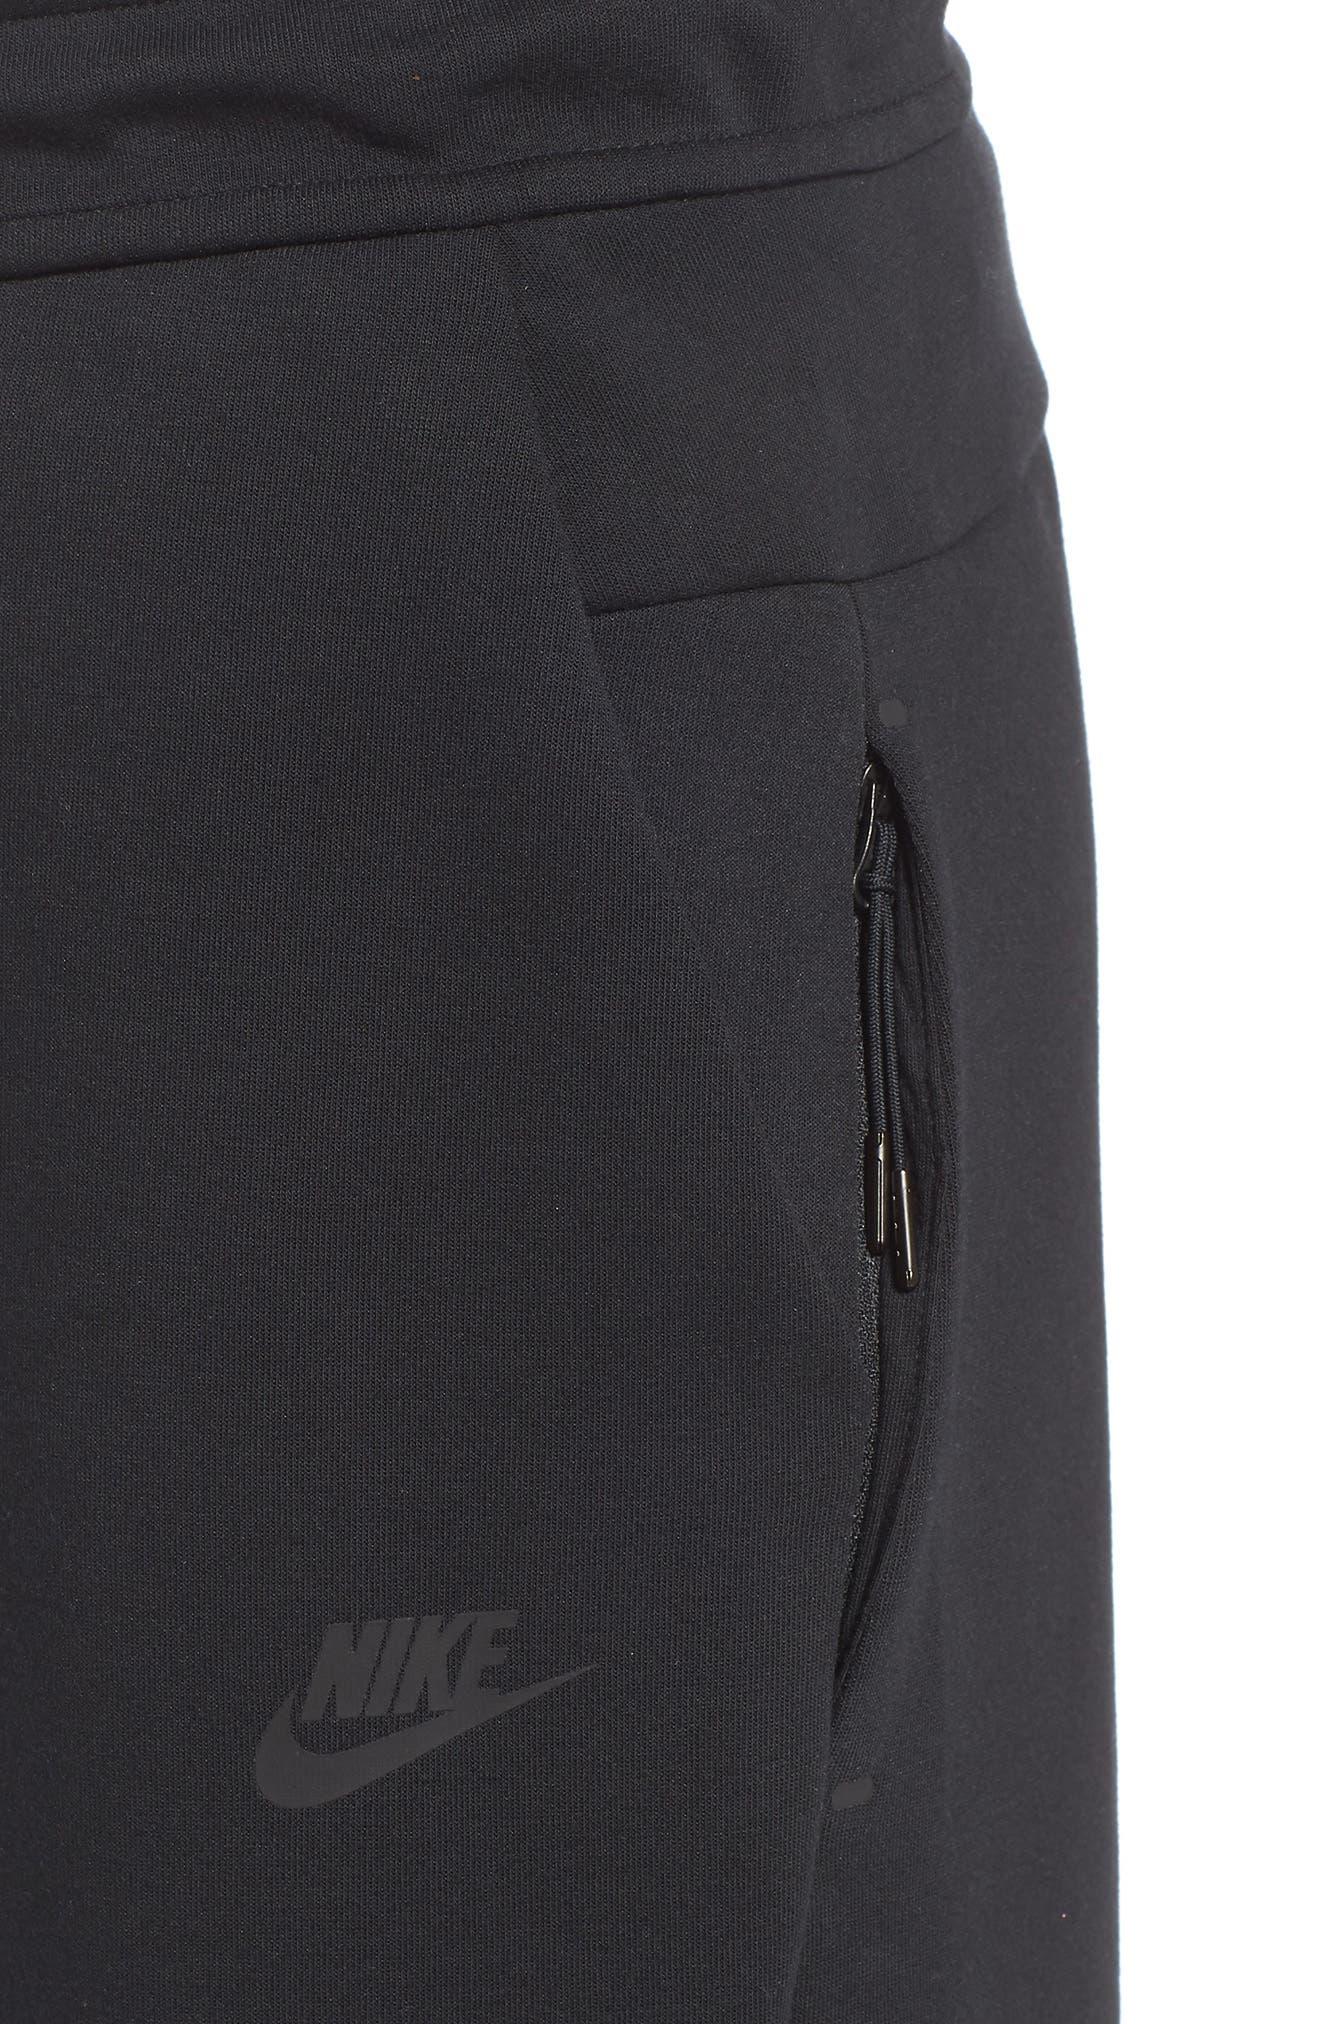 Tech Fleece Pants,                             Alternate thumbnail 4, color,                             BLACK/ BLACK